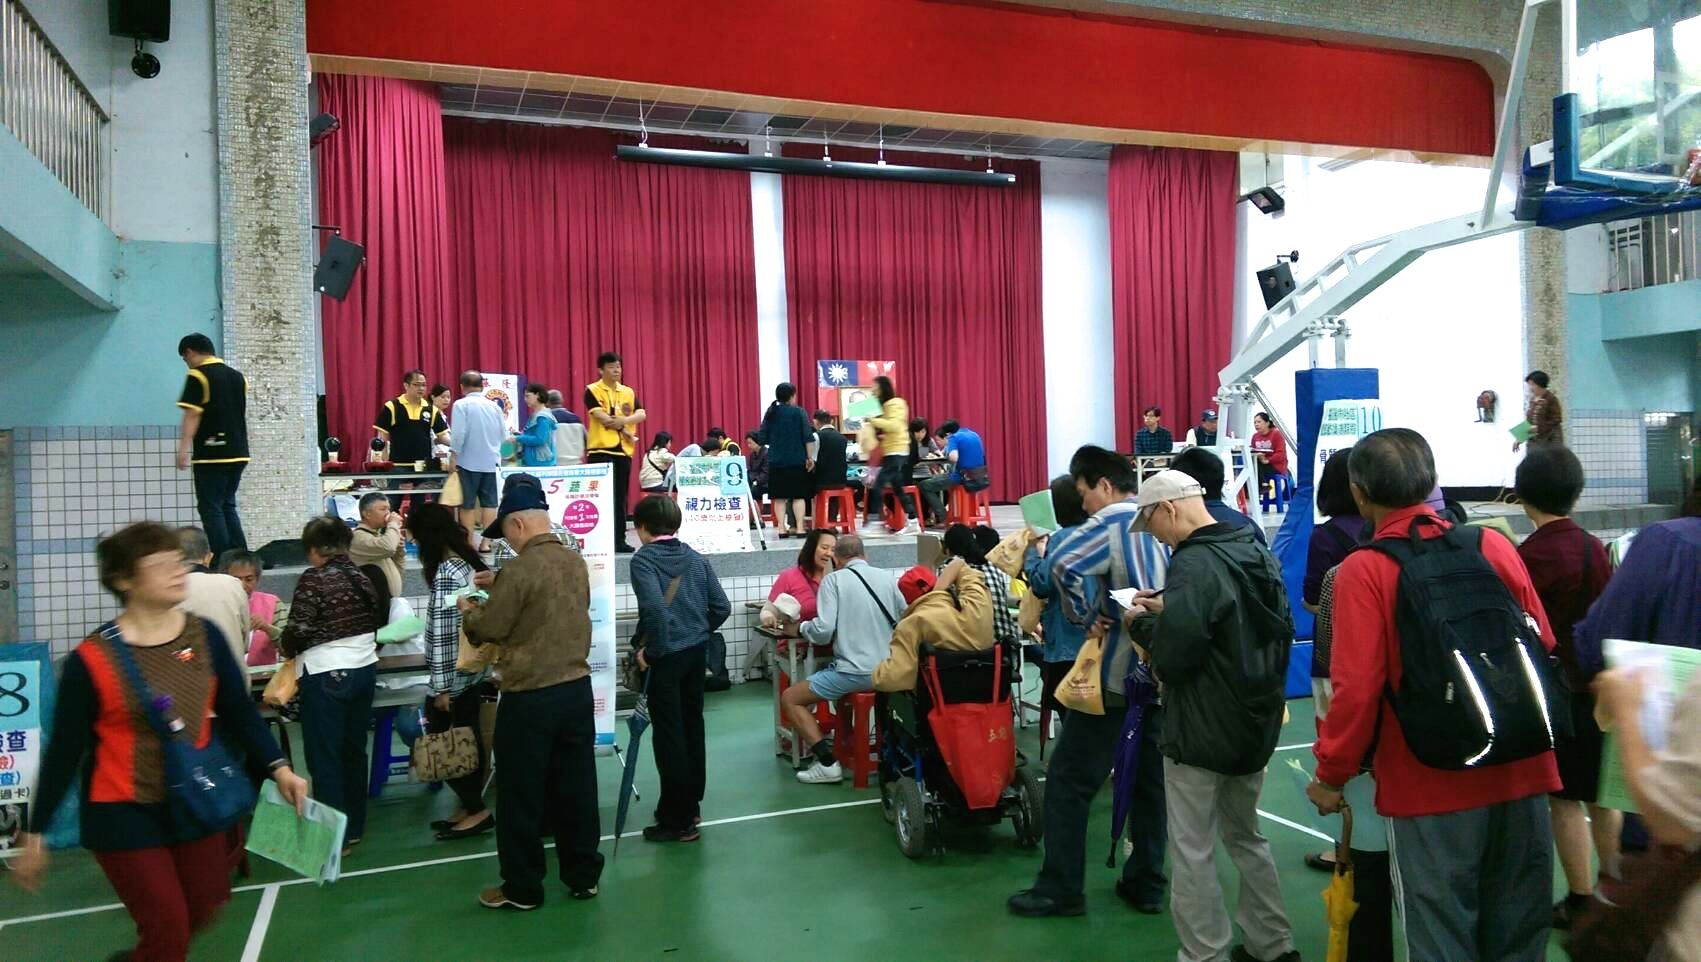 Keelung Hello Lionsclub Taiwan Provided Health Screenings Health Screening Health Health And Wellness